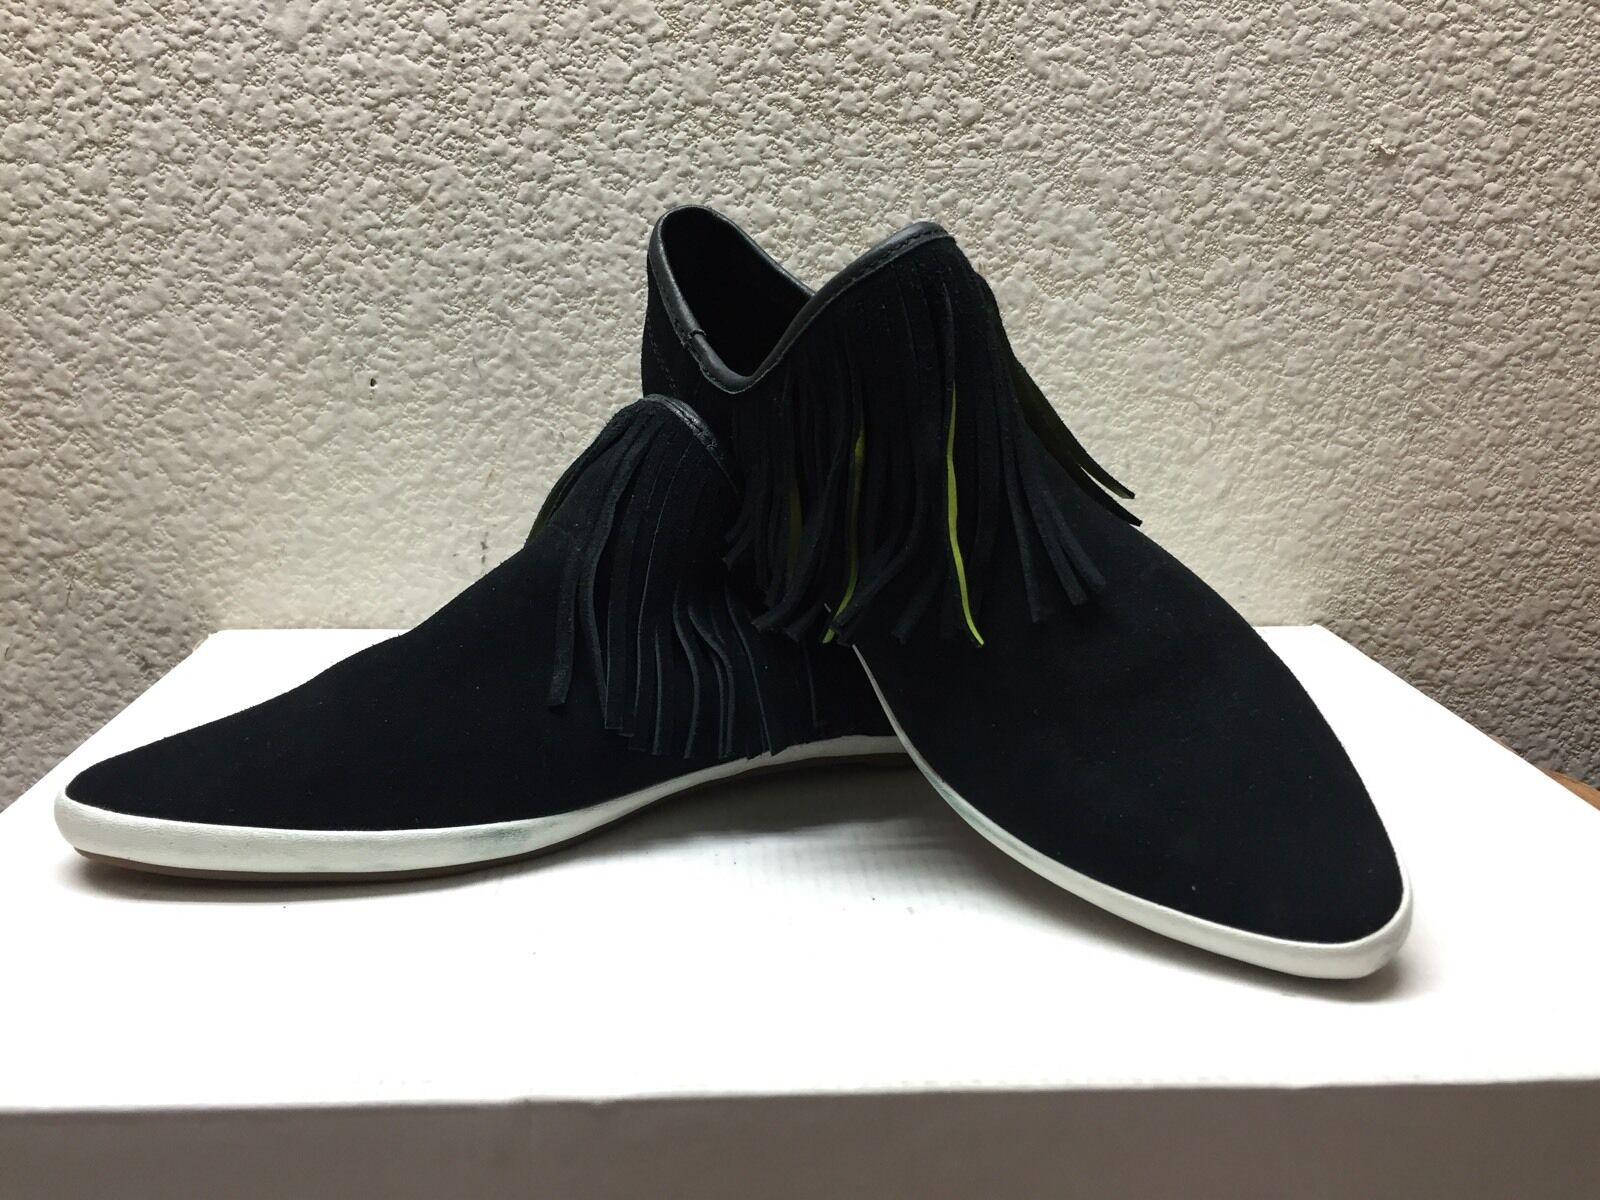 SANUK KAT FRINGE BLACK SUEDE SIDEWALK Schuhe Schuhe Schuhe US 7.5 / EU 38.5 / UK 5.5 -NWT d6f46b